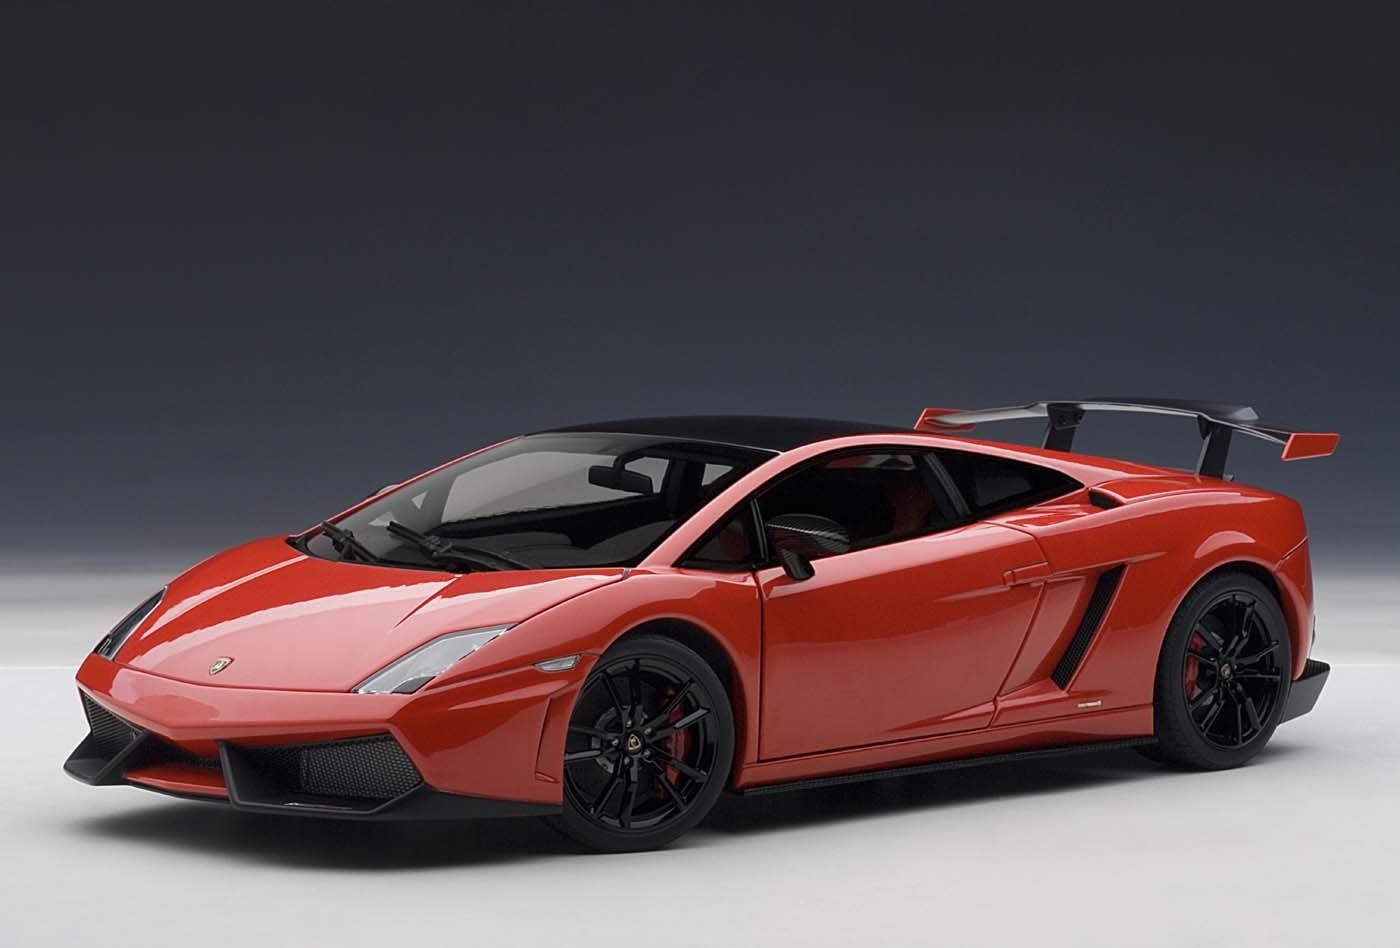 Autoart Highly Detailed Die Cast Model Red Lamborghini Gallardo